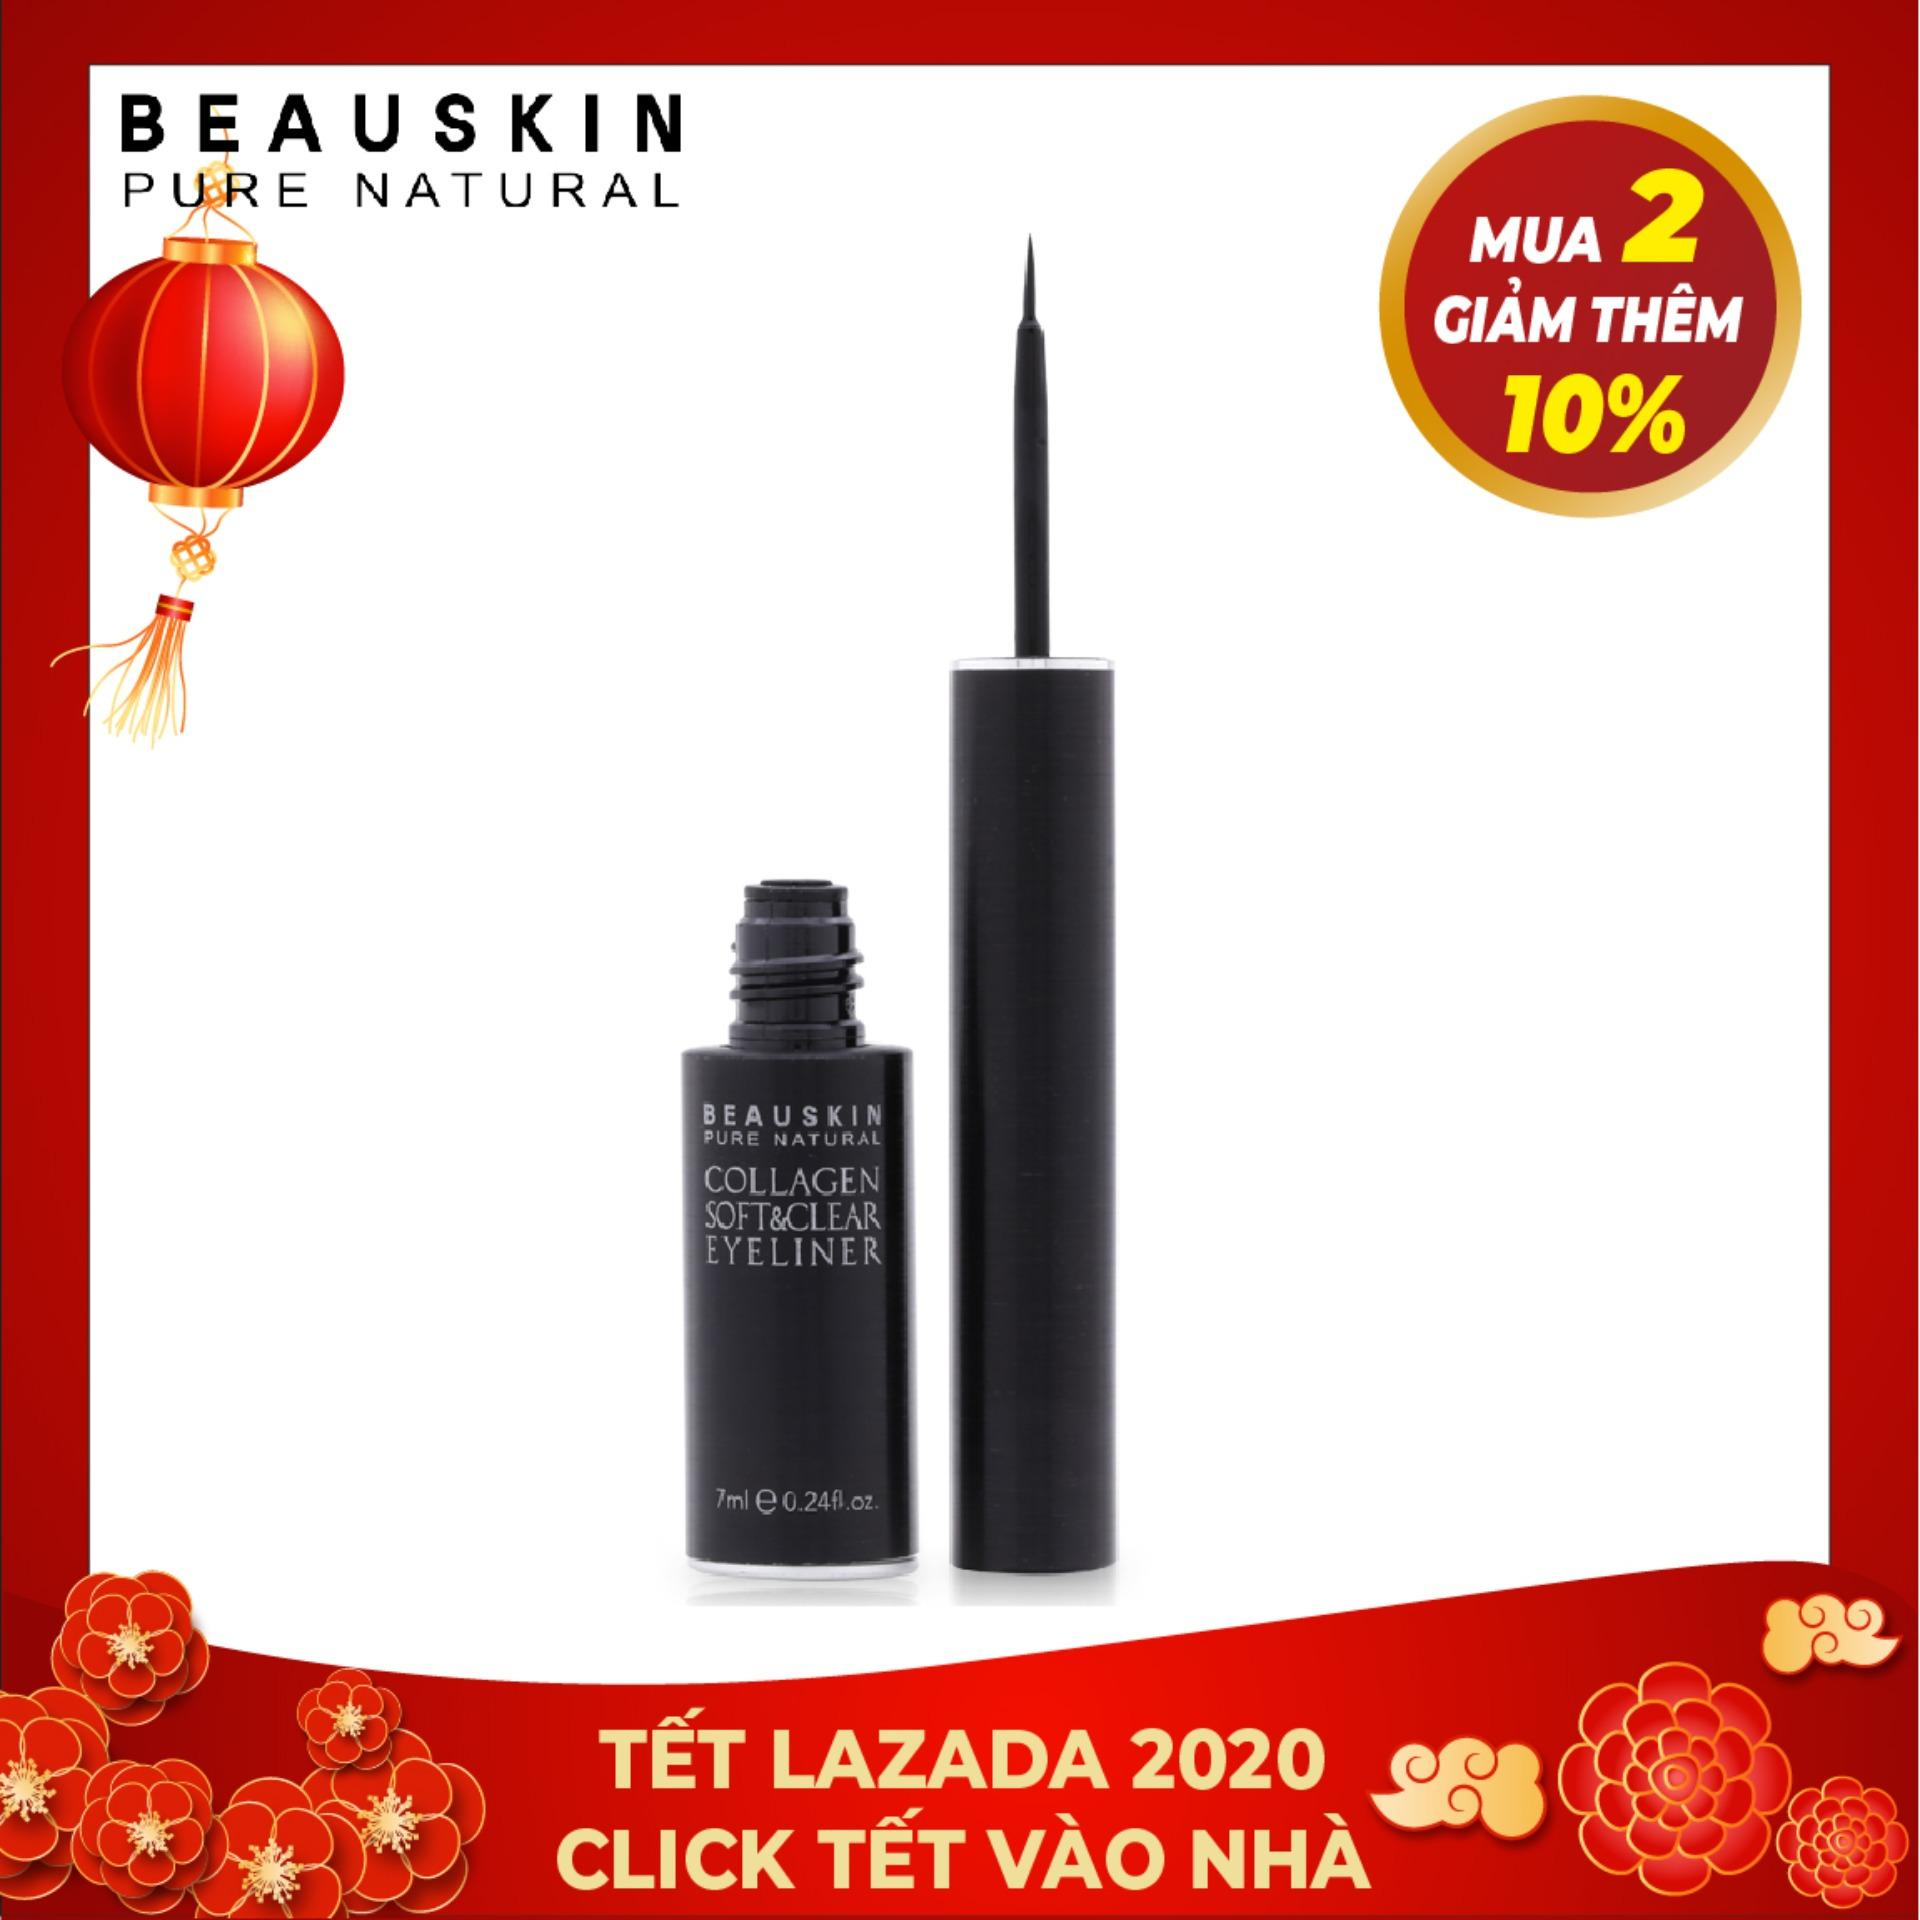 Kẻ mắt nước dưỡng mi không lem Beauskin Collagen Soft & Clear Eyeliner (Đen)